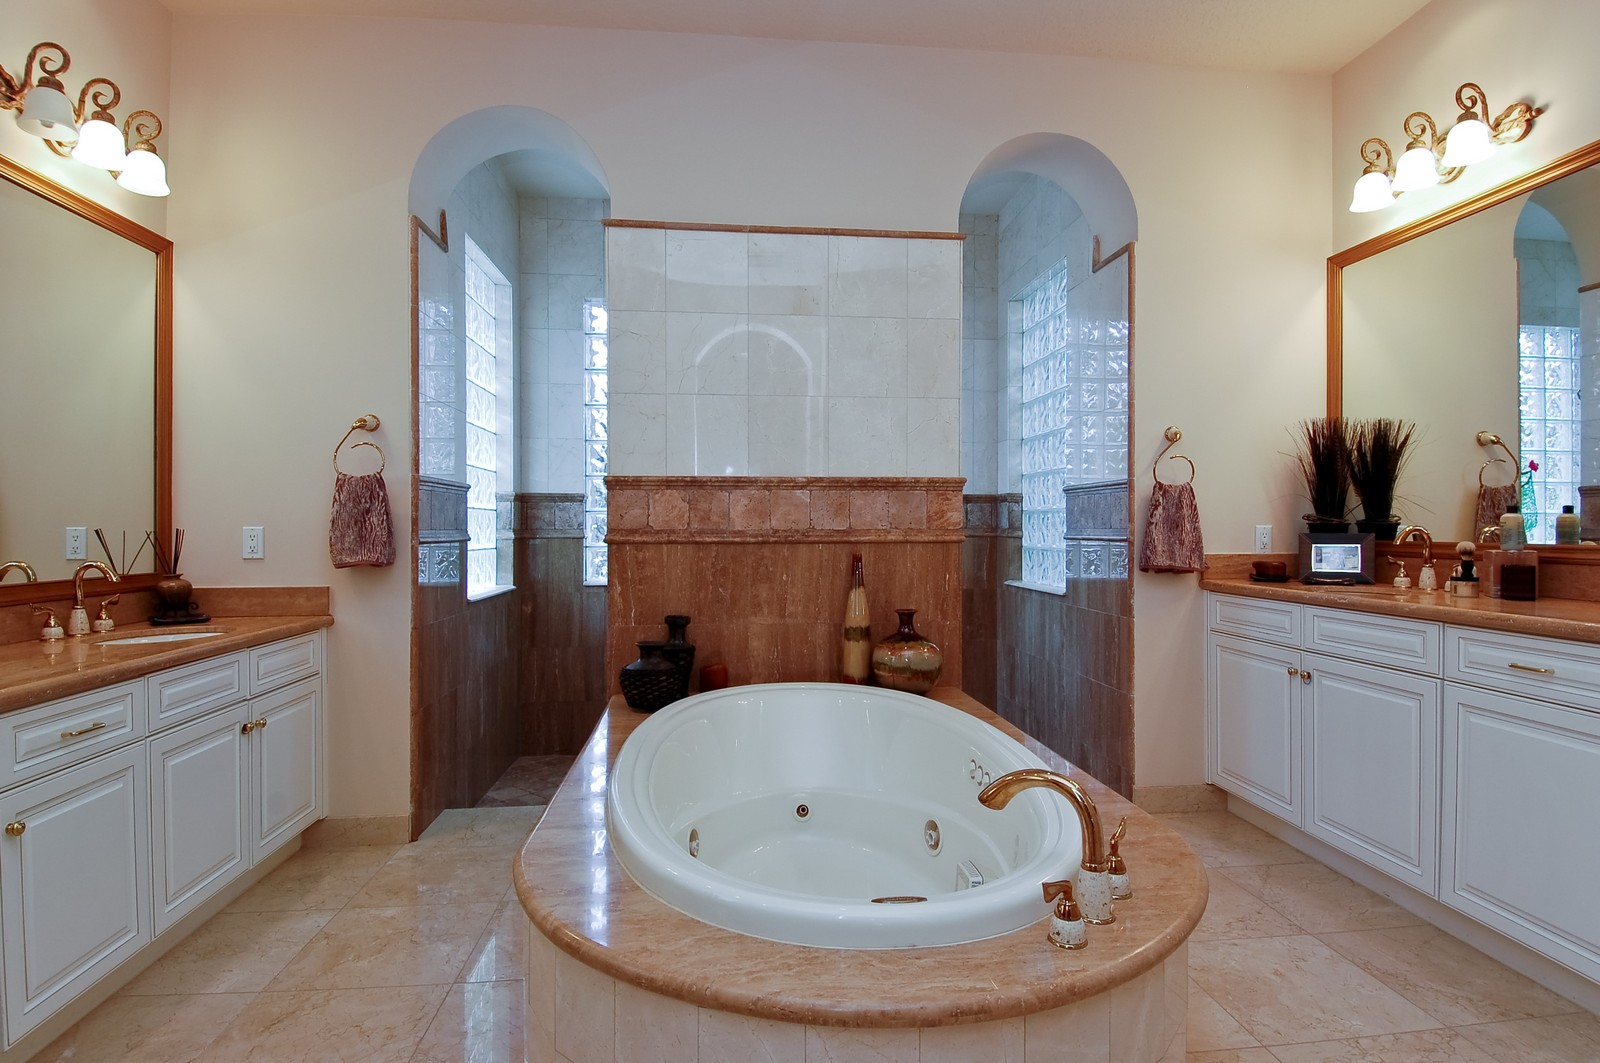 Real Estate Photography - 11687 NW 69th Pl, Parkland, FL, 33076 - acevedobath.jpeg